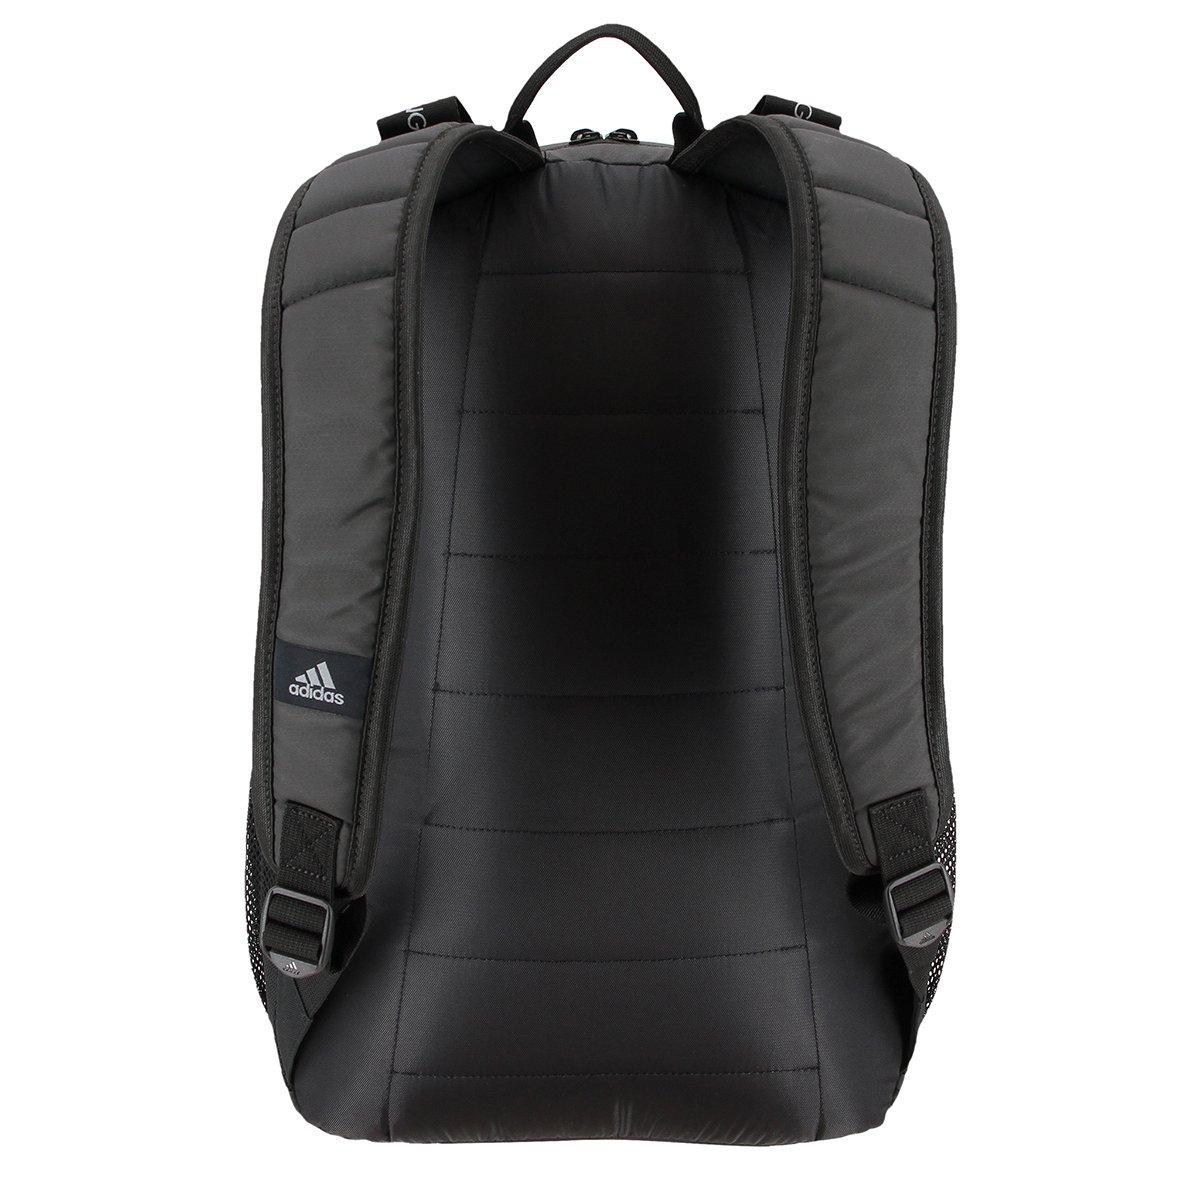 939bf24c8c Amazon.com  adidas Mission Backpack